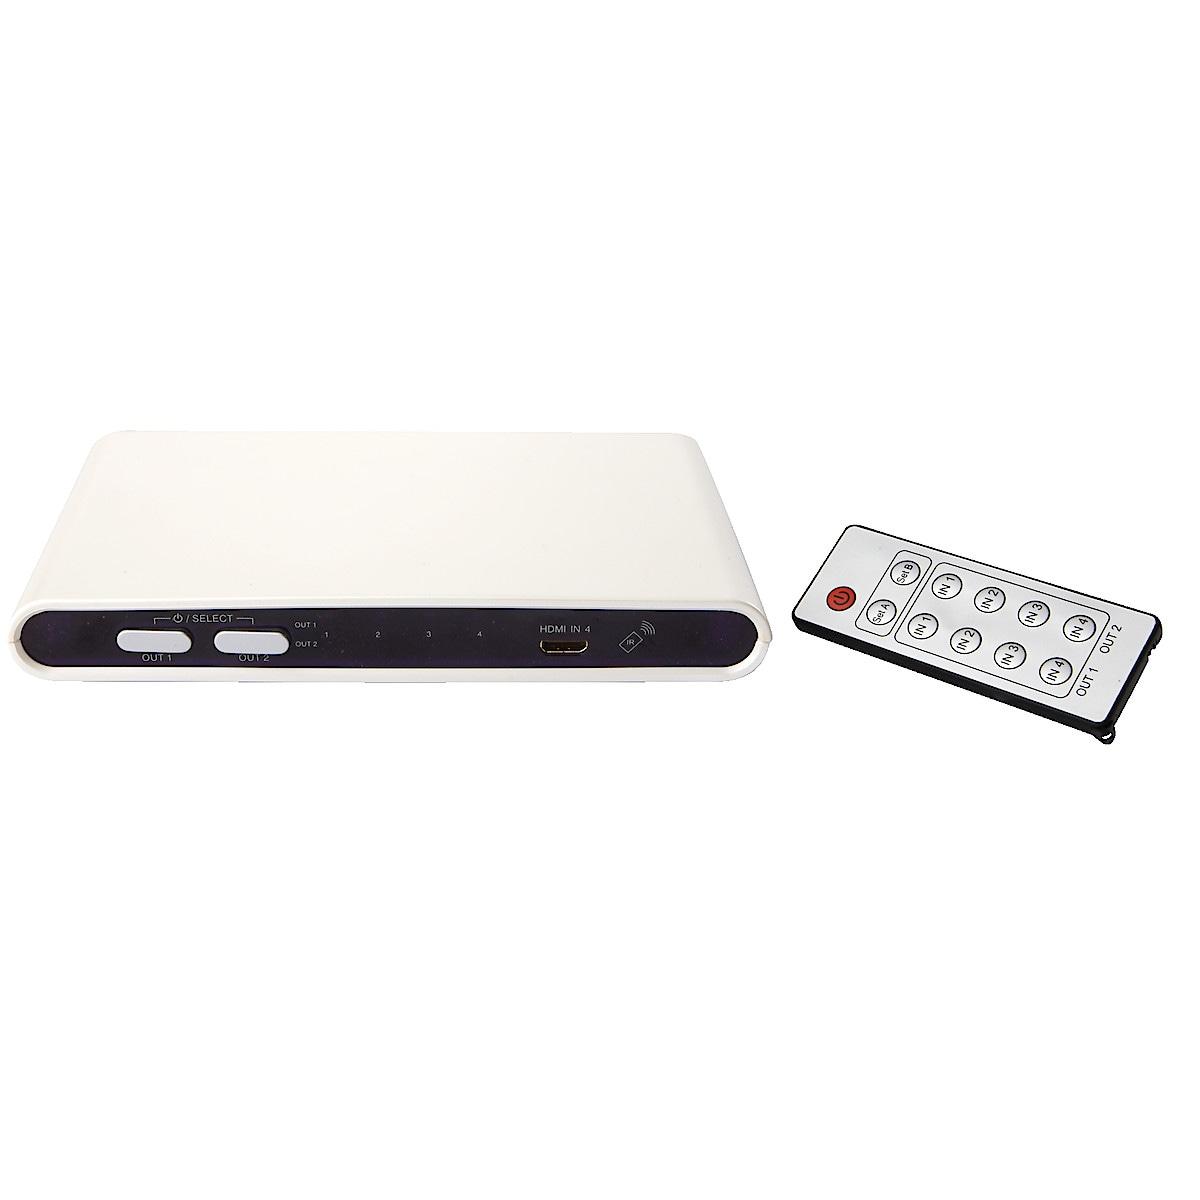 HDMI-växel